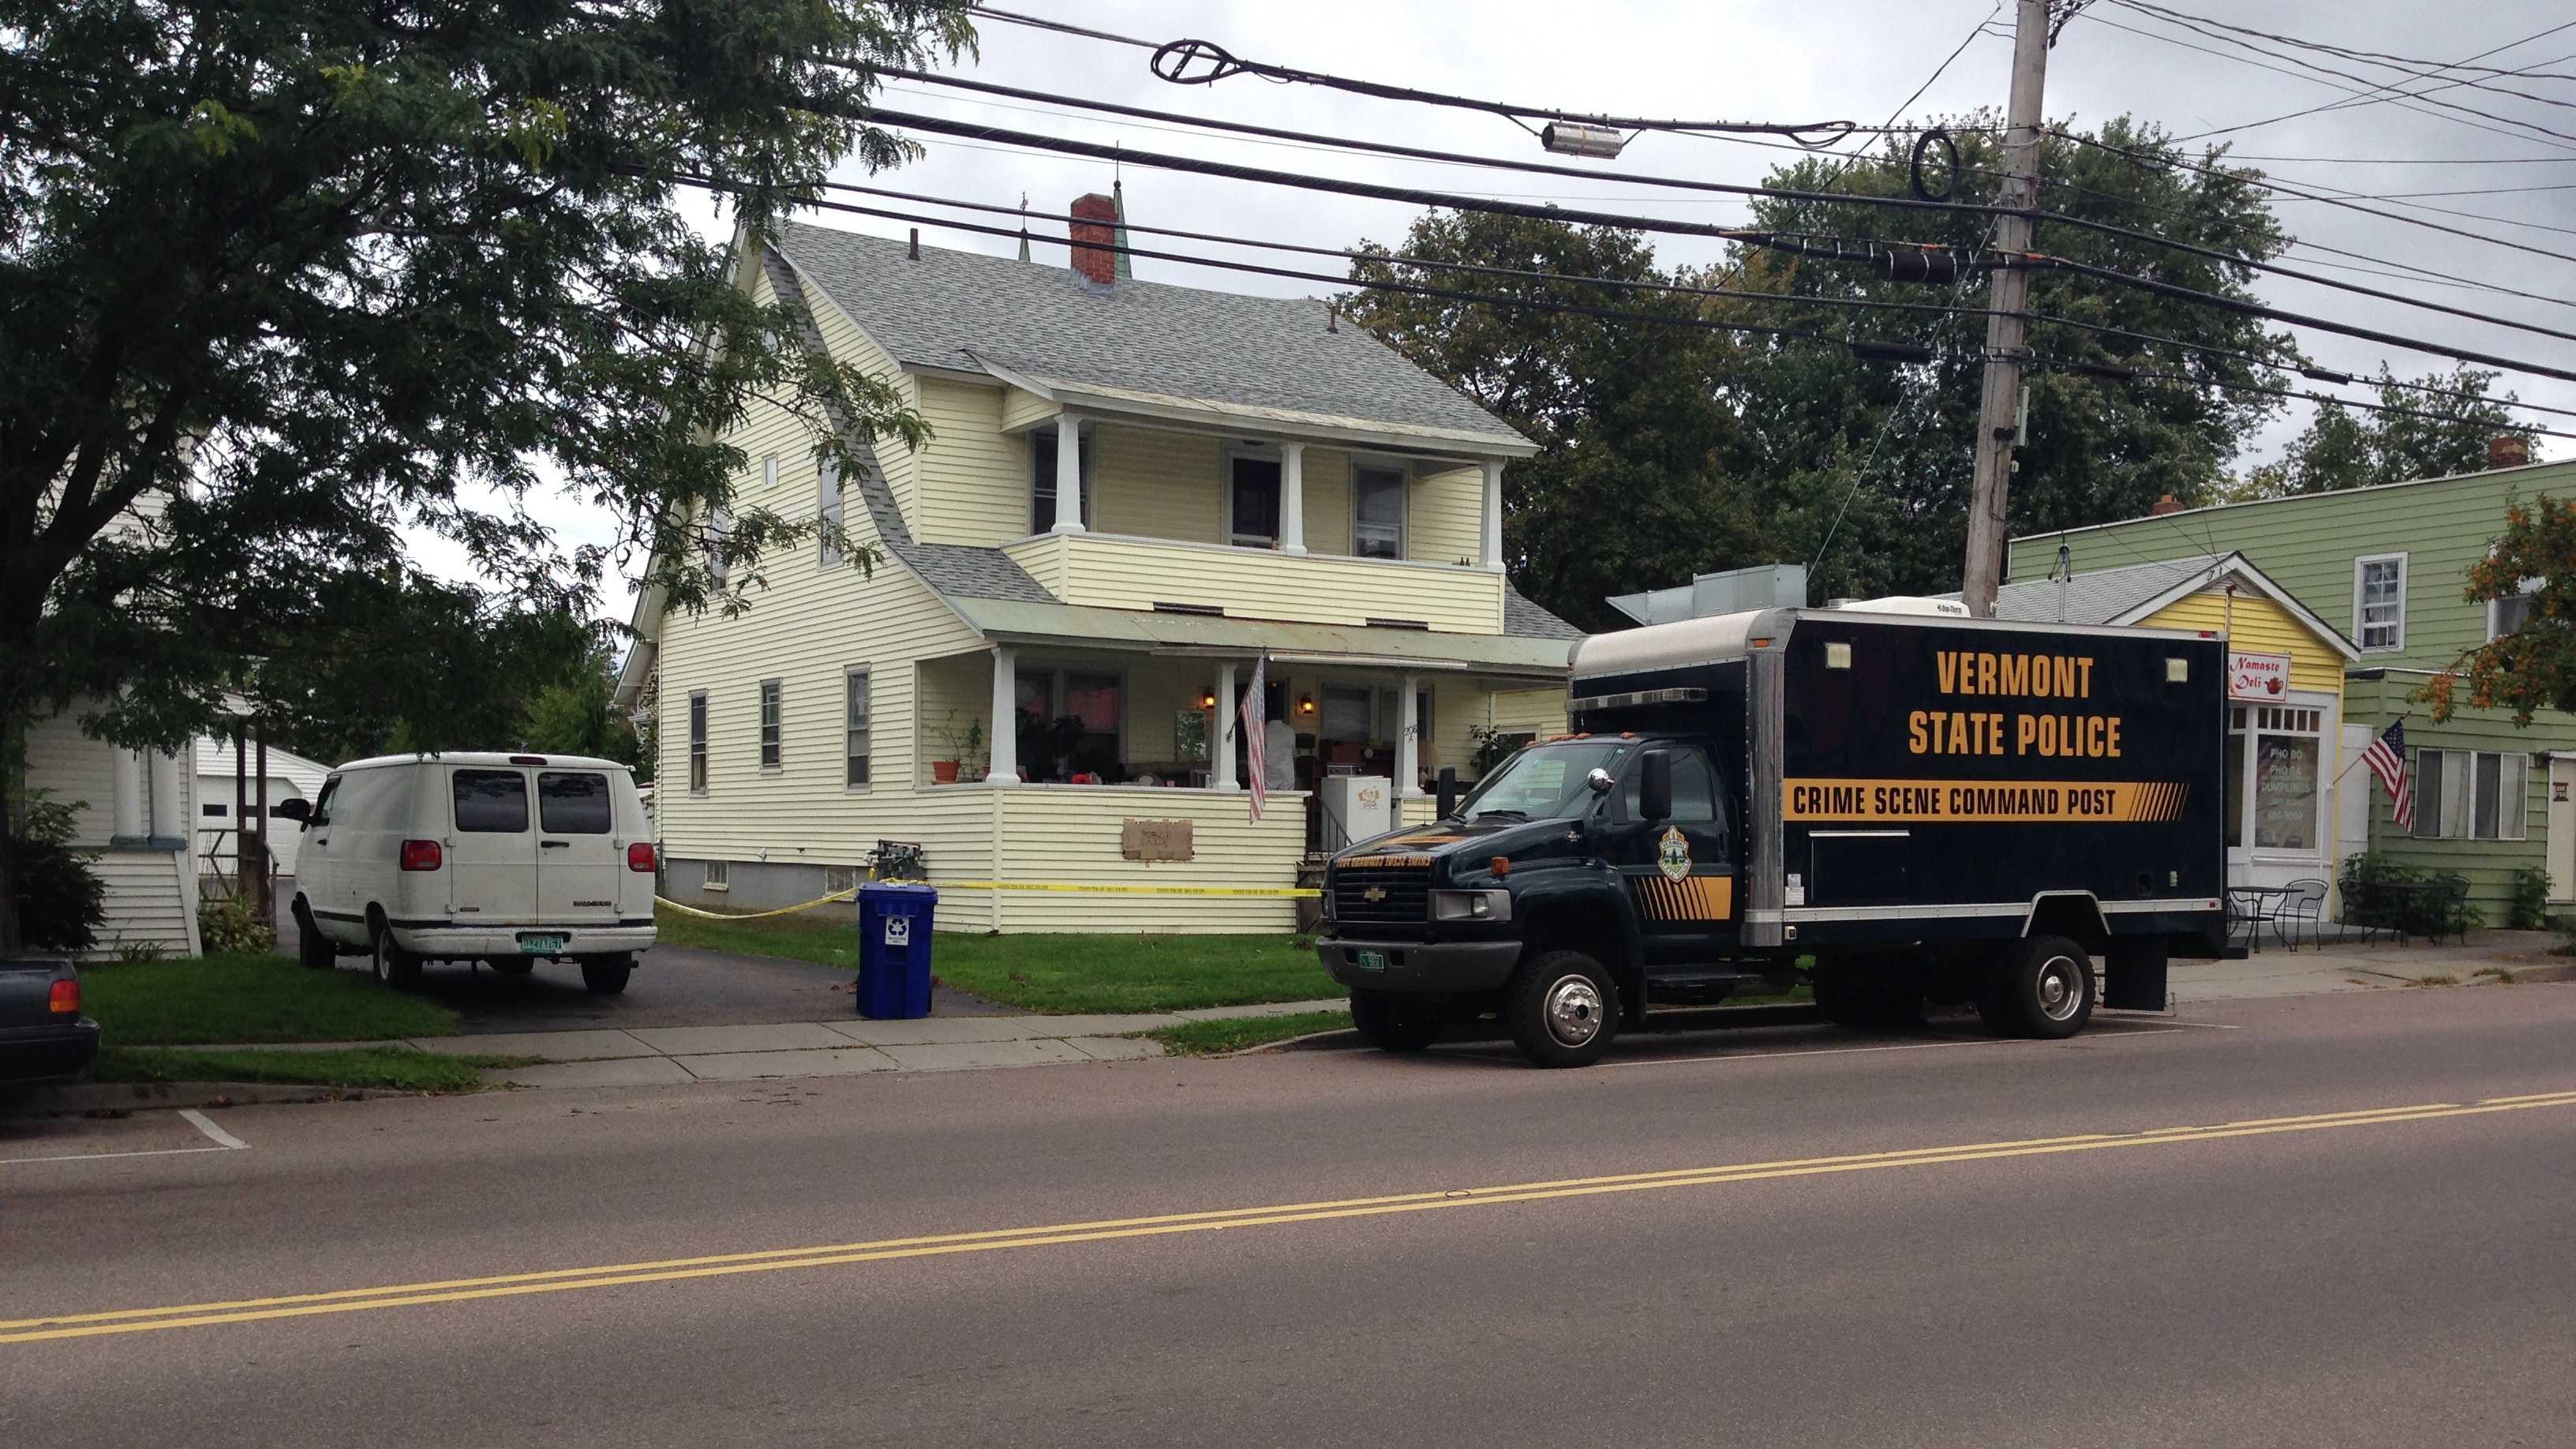 VSP Crime Scene Command Post outside Winooski Home